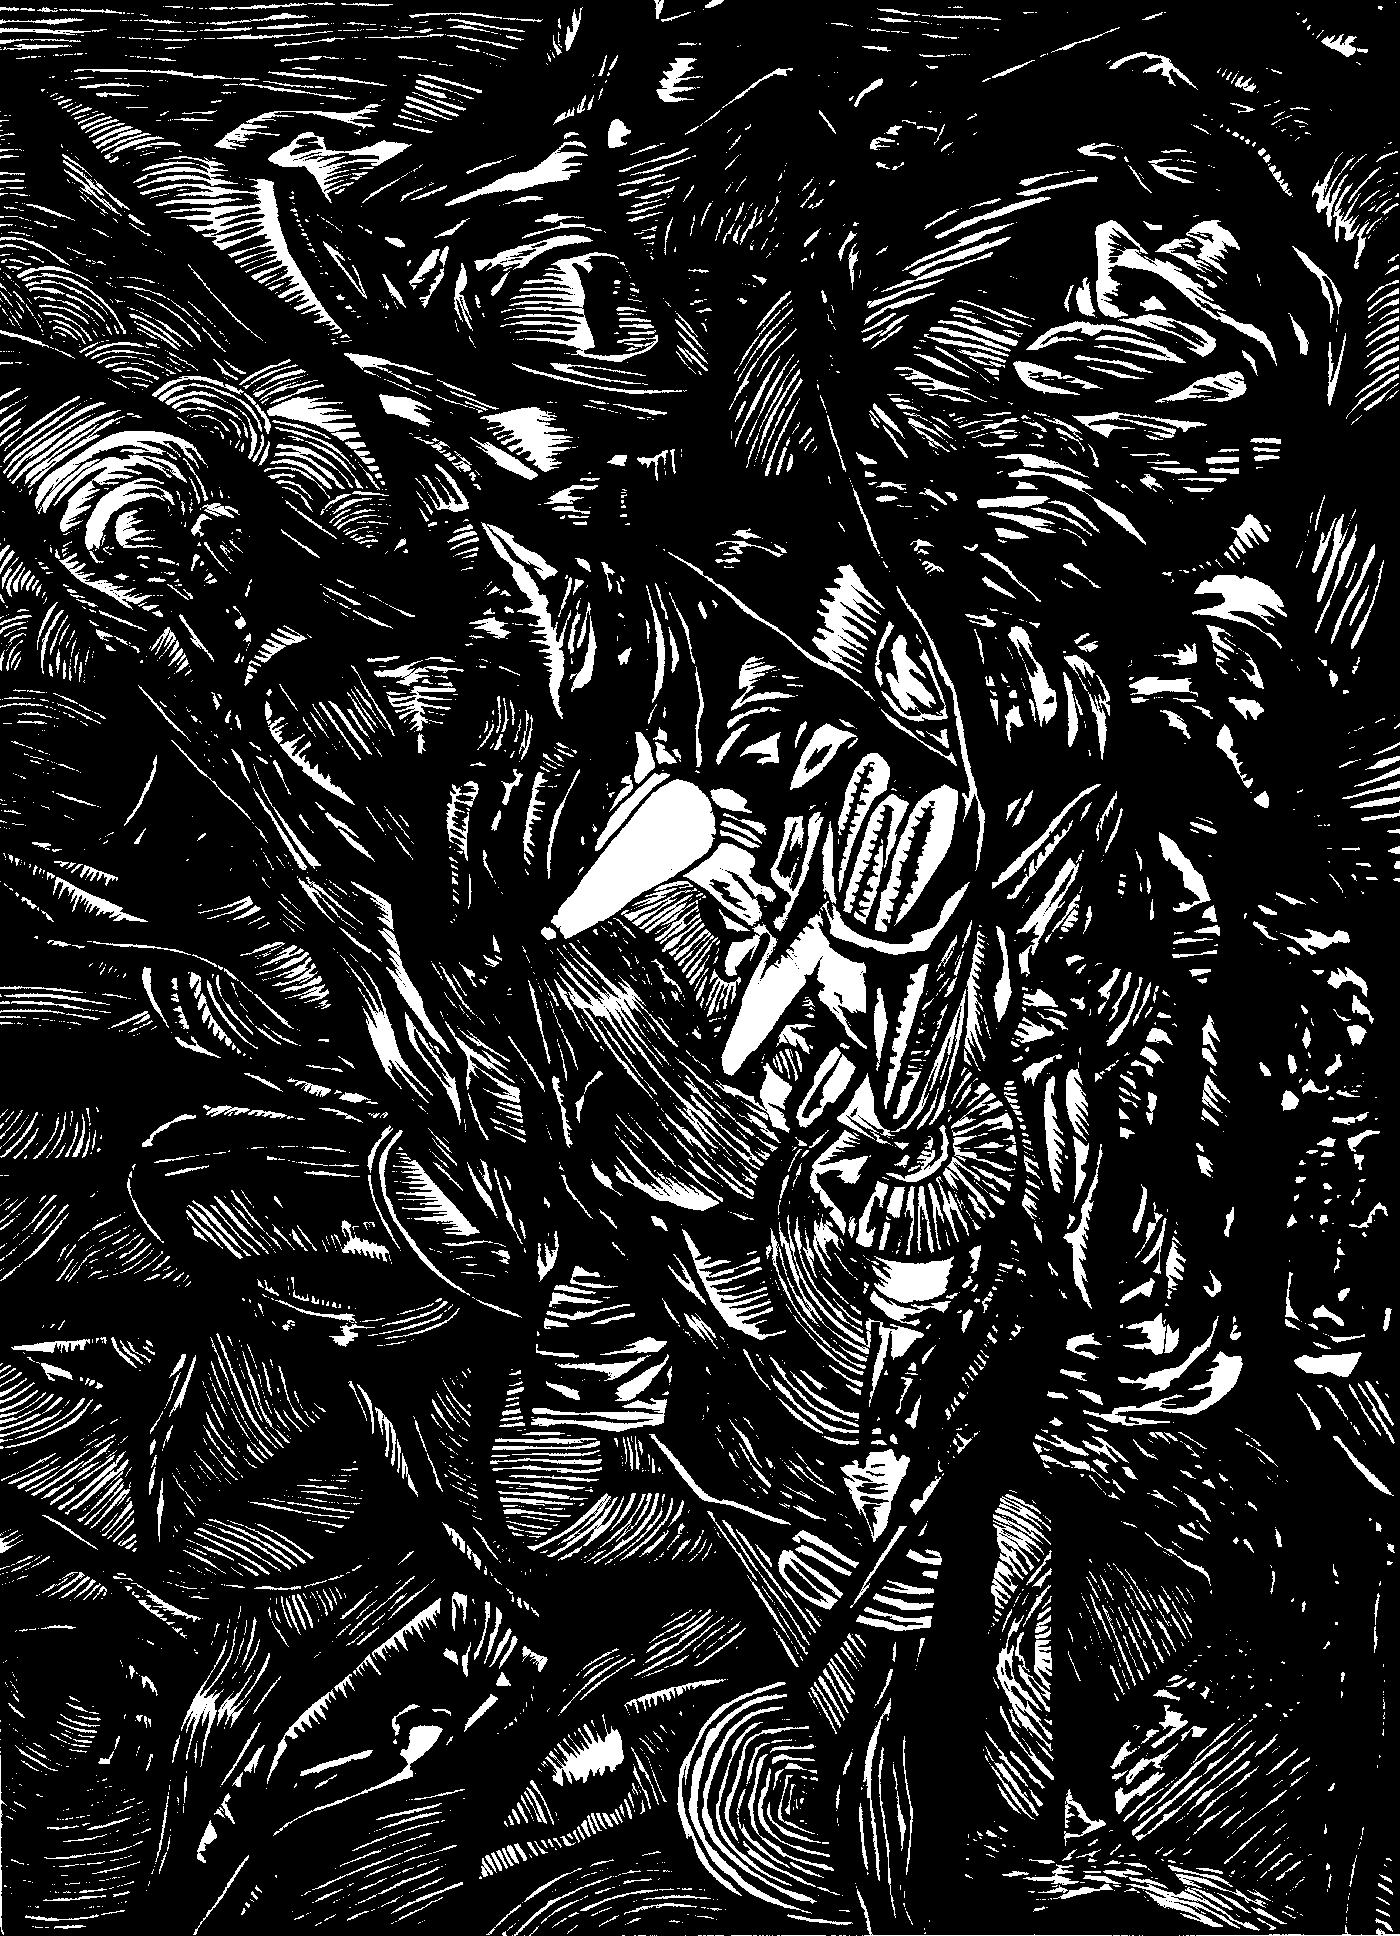 InkSketch5.png